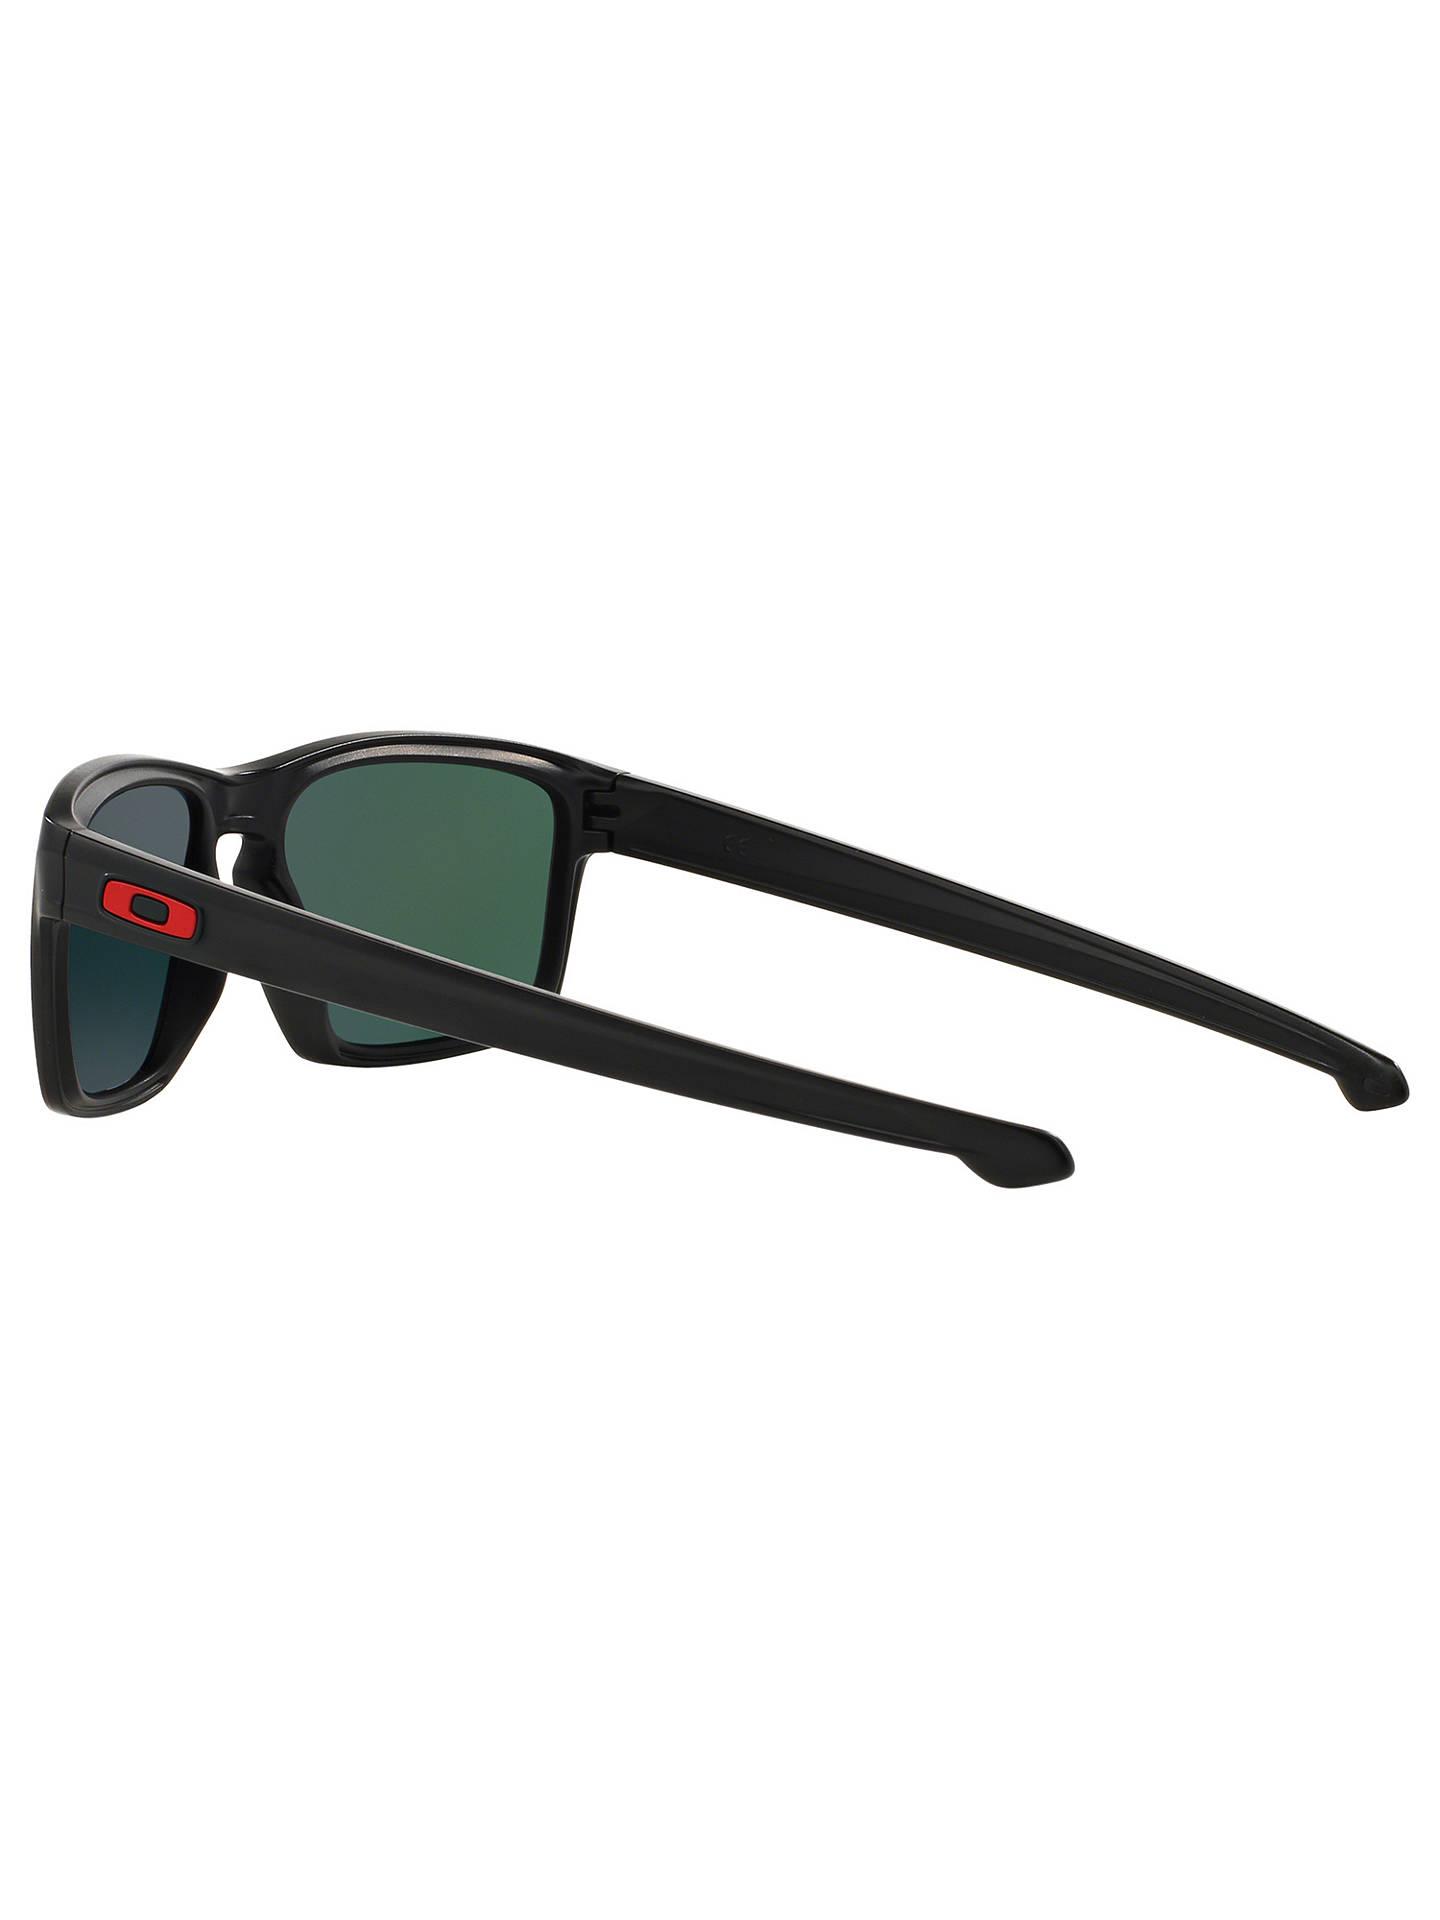 327282c42b87a ... Buy Oakley OO9262 Sliver Scuderia Ferrari Collection Rectangular  Sunglasses